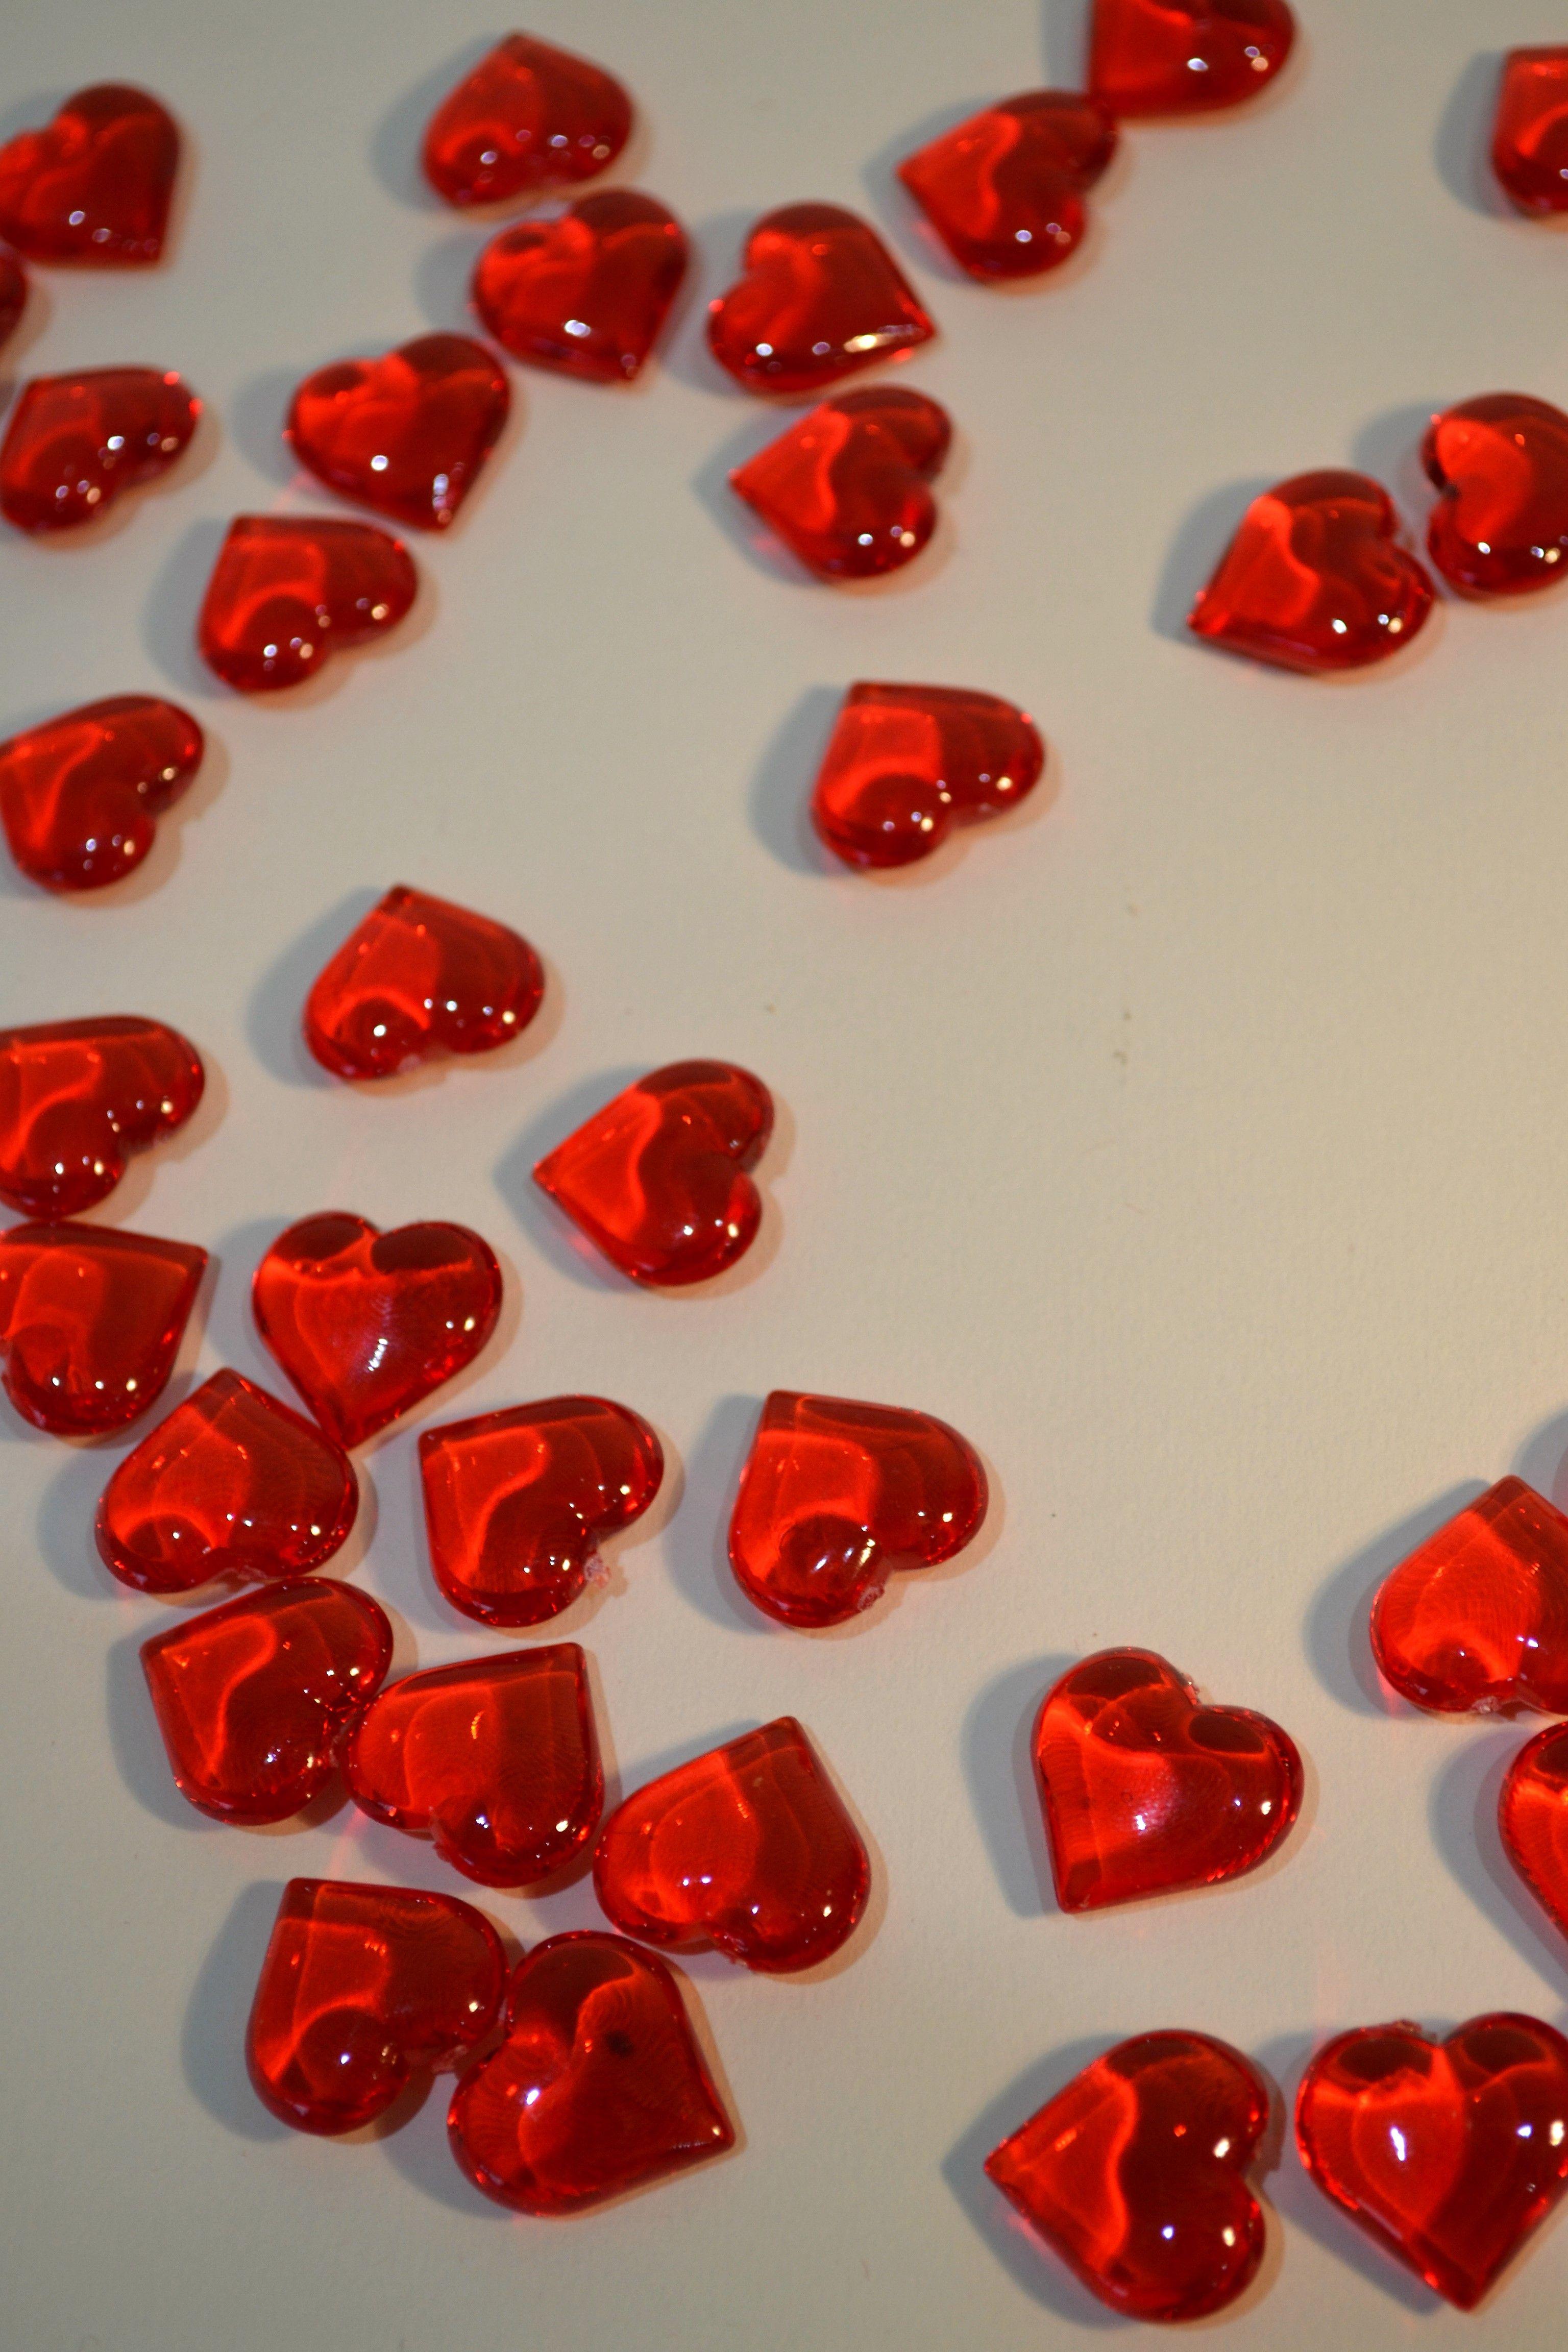 "Poundland Valentine S에 ÌžˆëŠ"" Casse Noisette님의 Í•€ ˳µê³ ˹ˆí‹°ì§€ Í•˜íŠ¸ ̈˜ìœë¹""누"